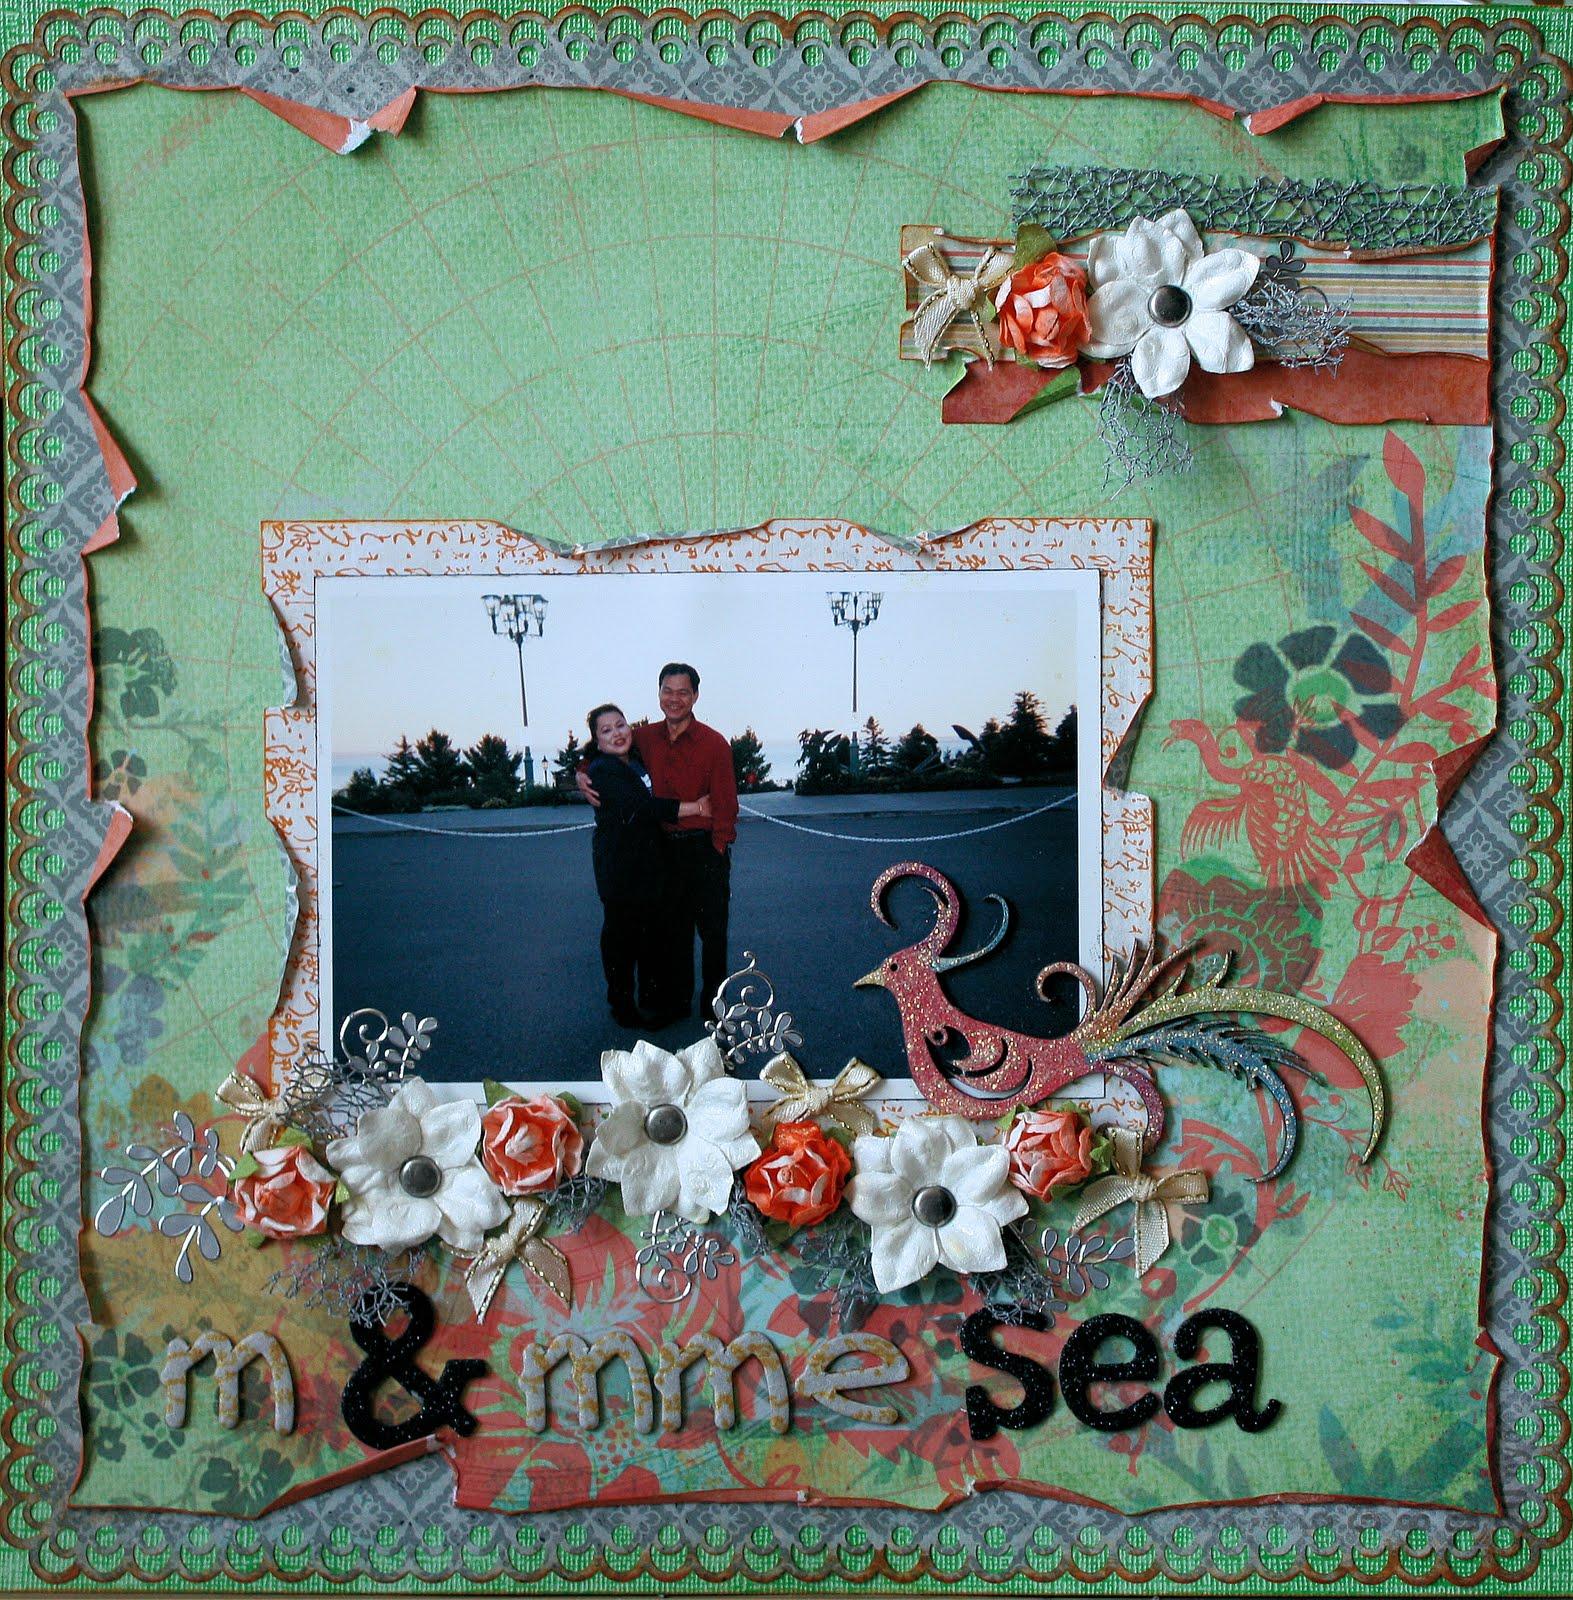 http://2.bp.blogspot.com/_AkQ43Eh7eLM/TGsTEP_UNII/AAAAAAAAB7w/N0uTRZzeP0w/s1600/m+et+mme+sea.jpg